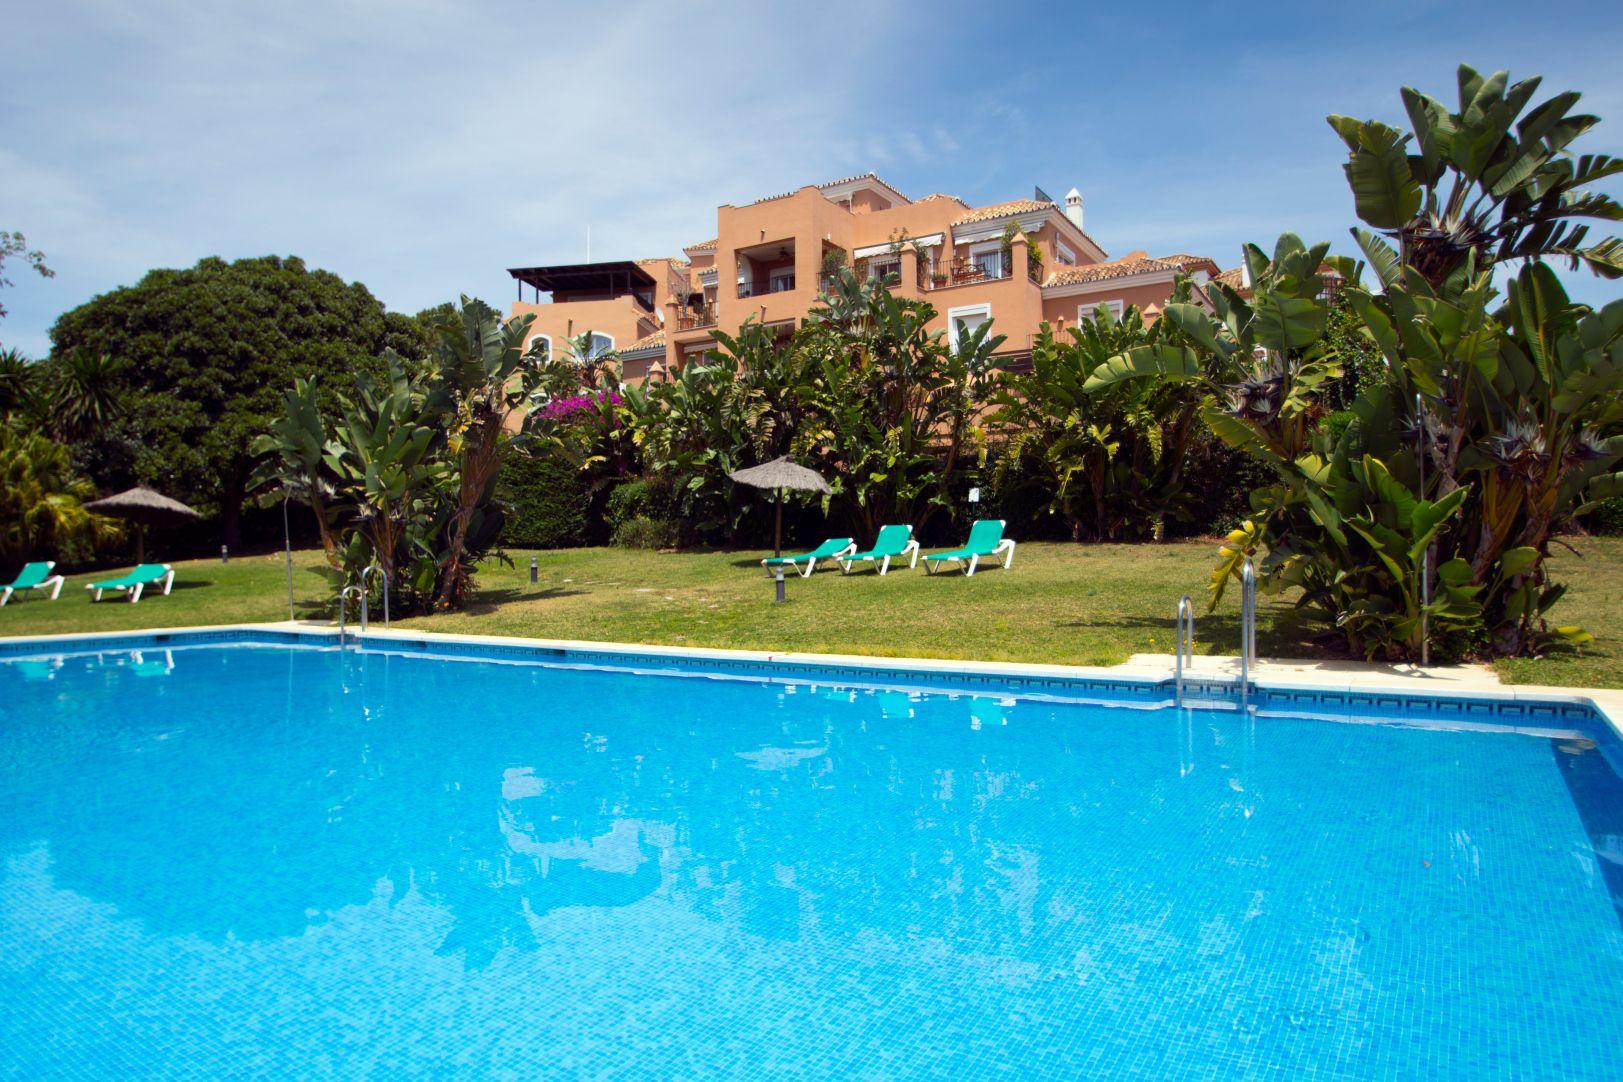 Appartement à vendre dans l'urbanisation Guadalmina Alta, Marbella